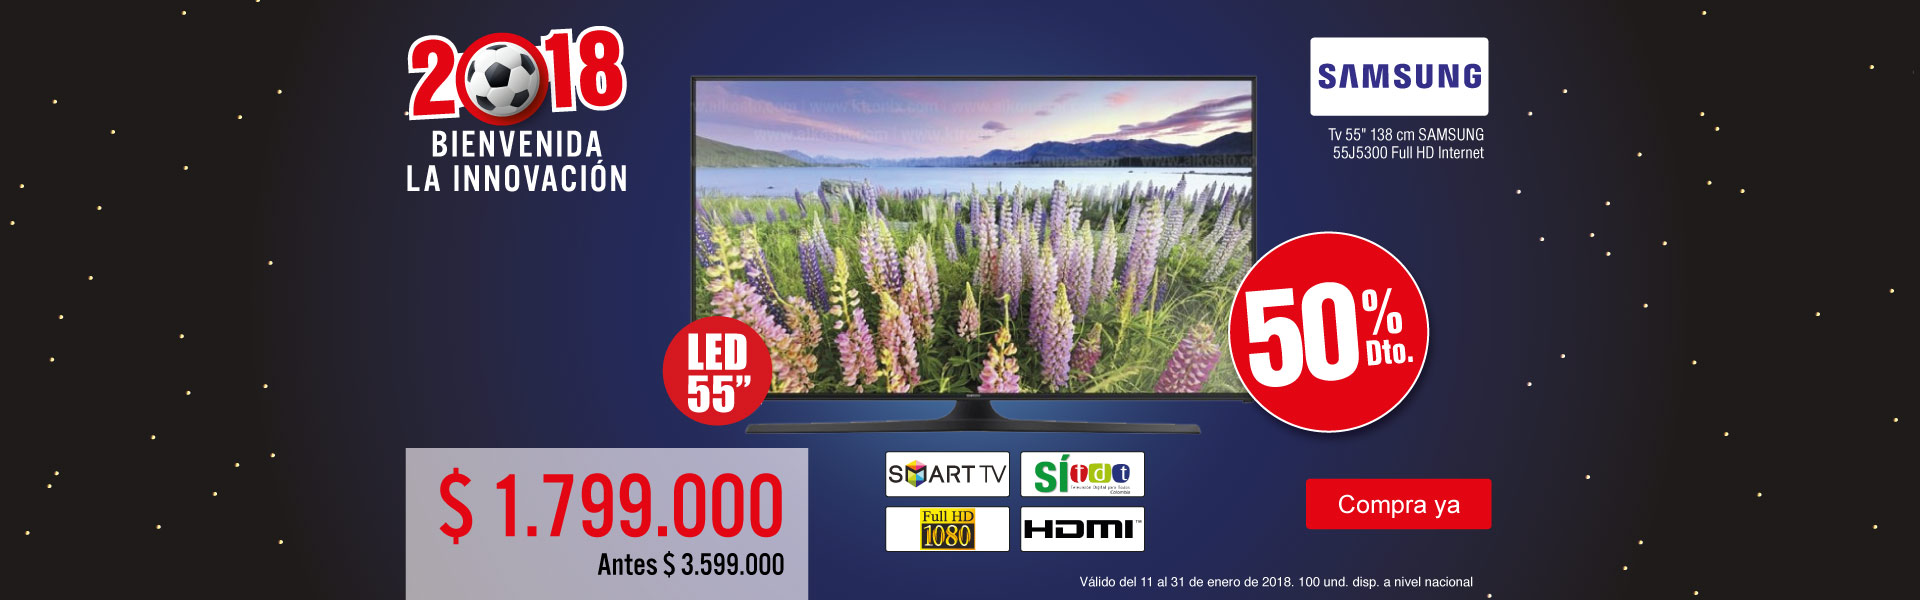 PPAL KT-2-TELEVISOR SG 55J53-TV-ENERO17/19